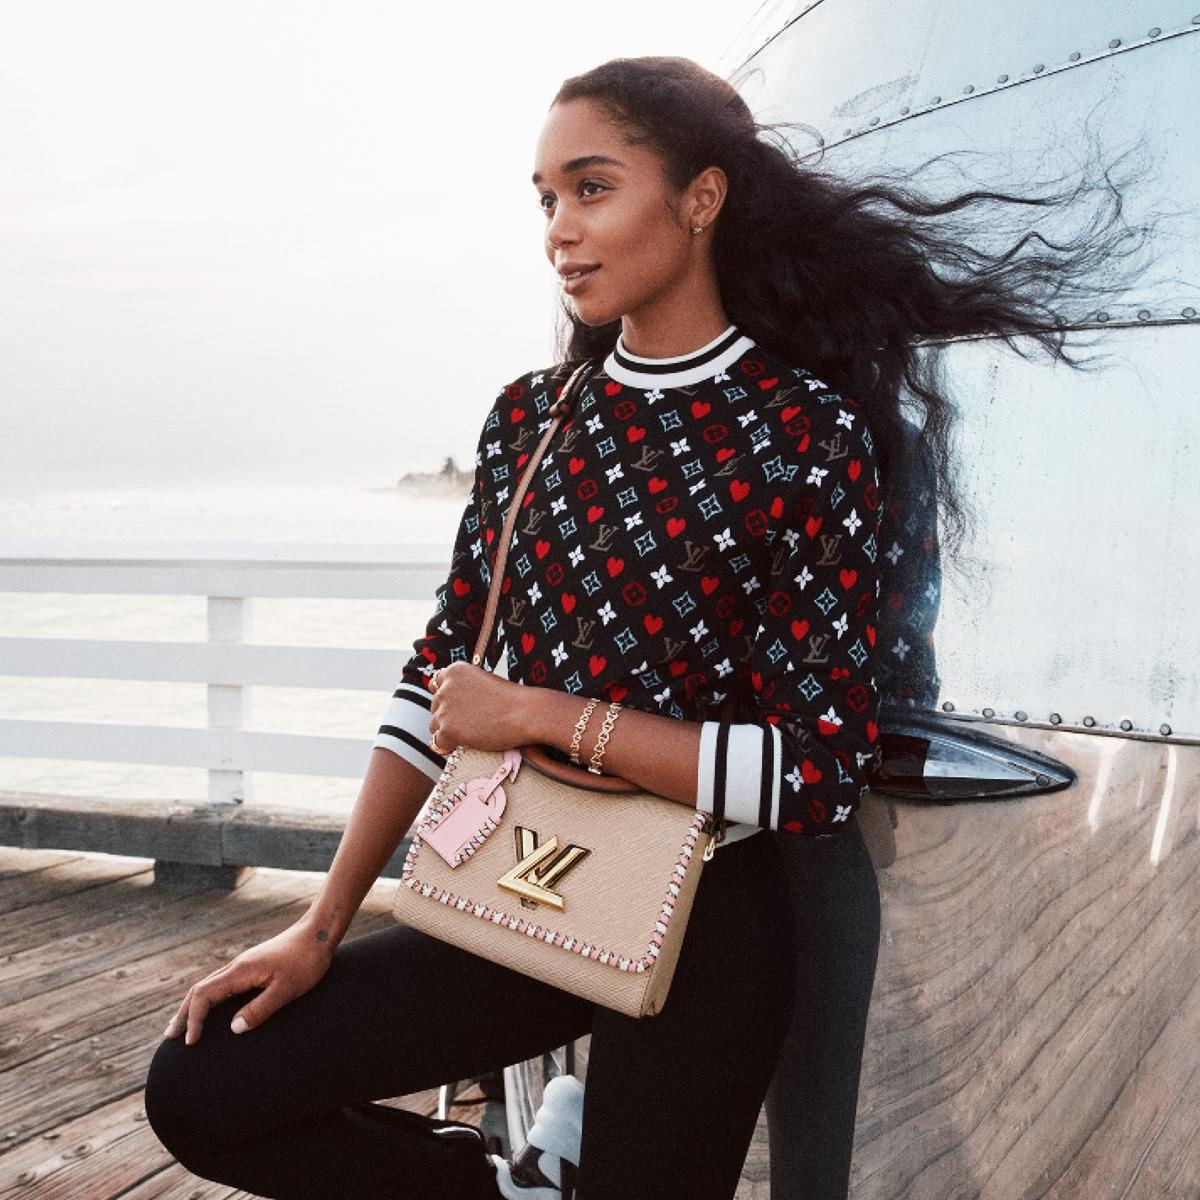 Louis Vuitton spring 2021 Ad Campaign Film & Photos